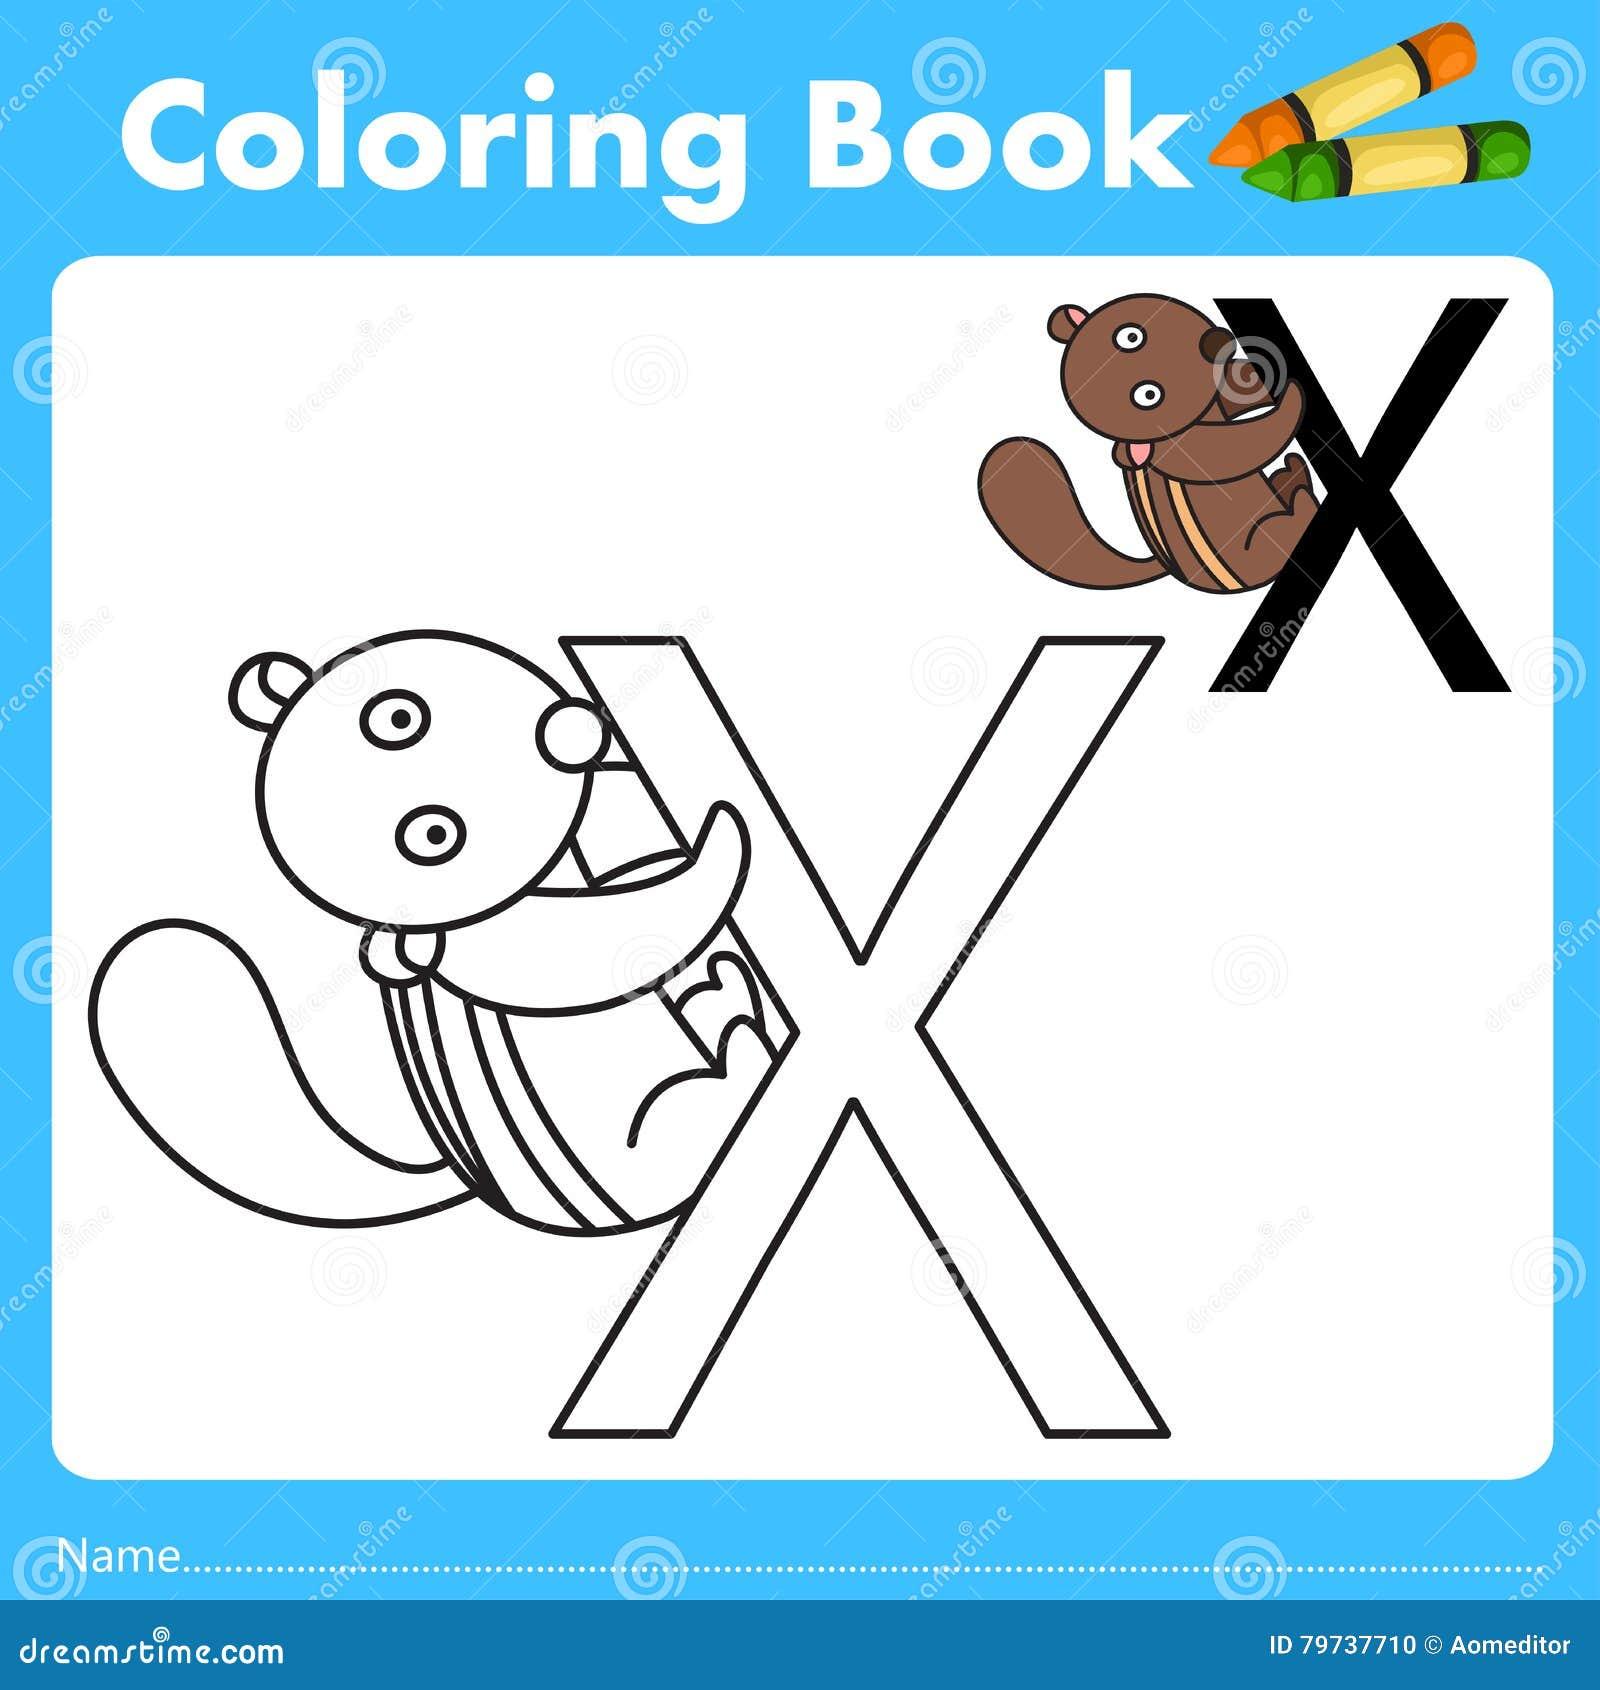 Book color illustrator - Animal Book Color Education Illustrator